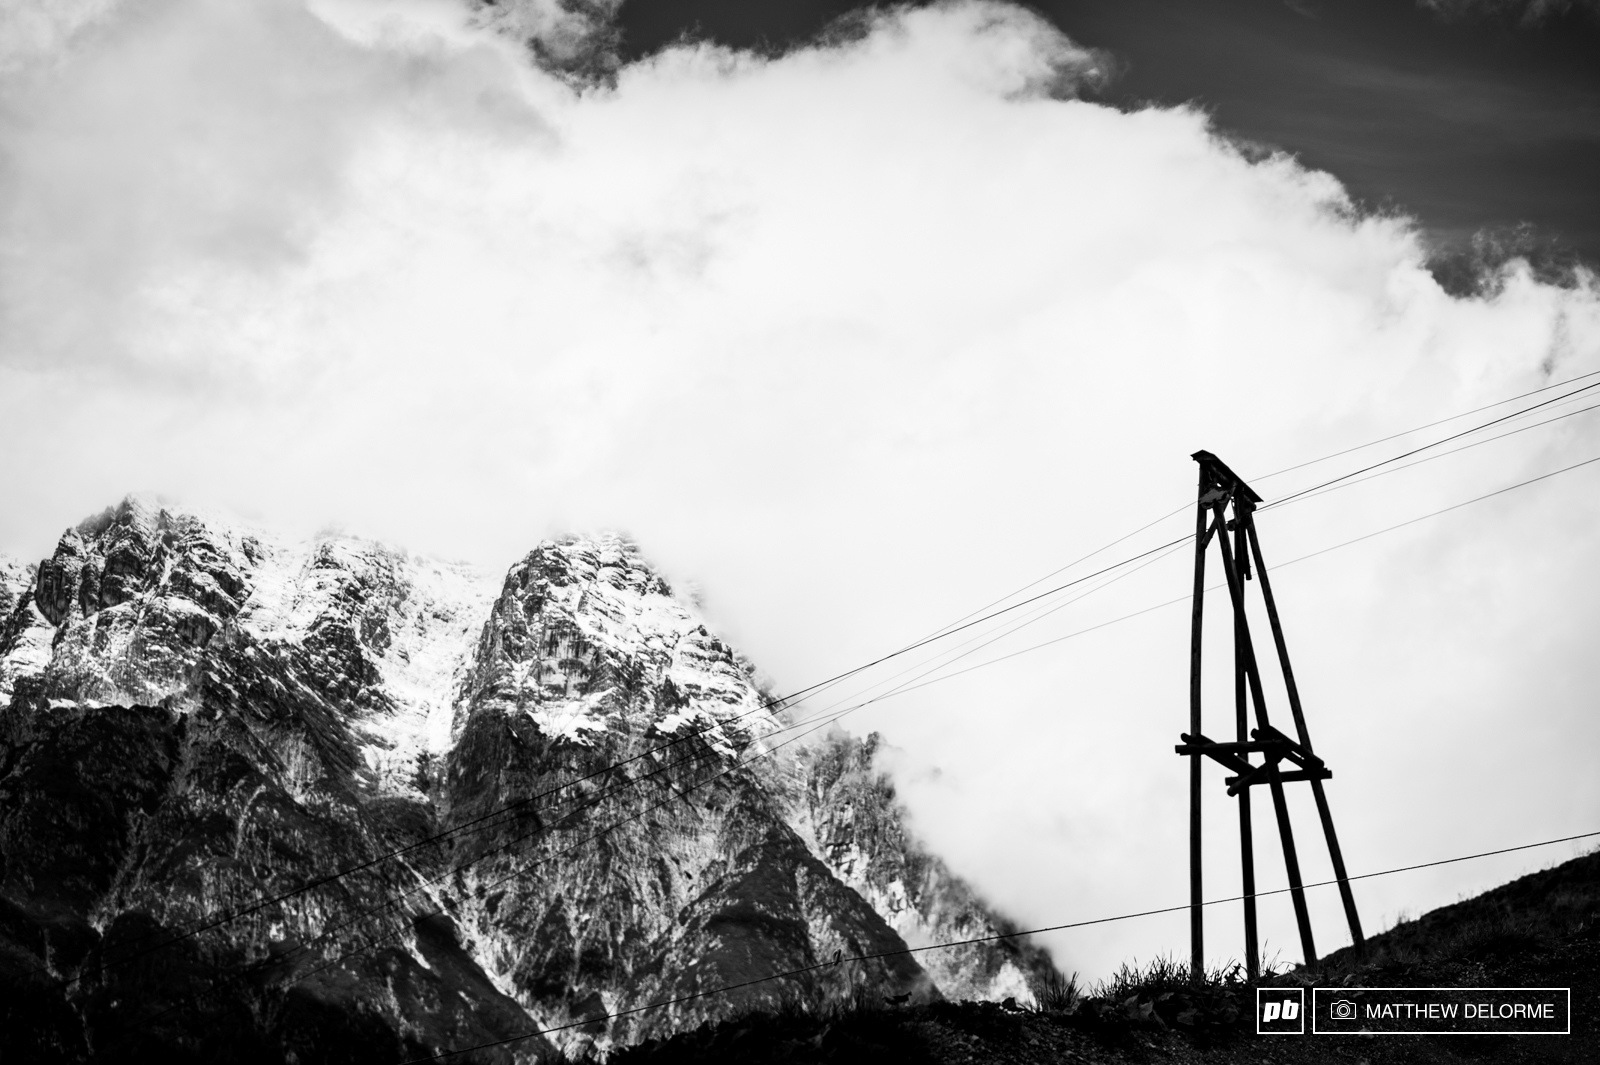 Across the way, jagged granite peaks loom large.